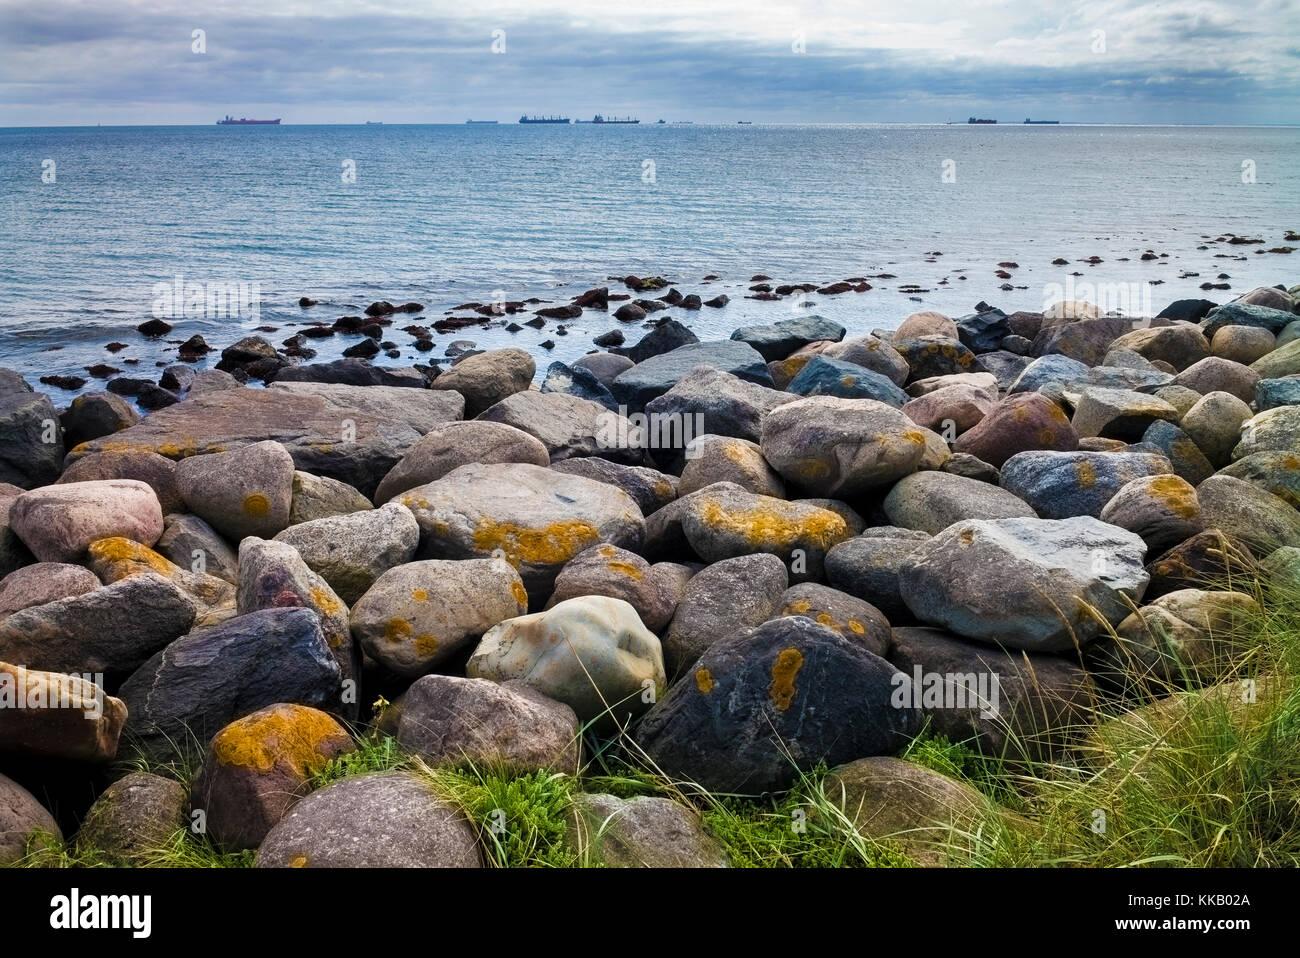 oil tankers off Skagen beach peninsula Headland, meeting of the North Sea and the Baltic Sea, Grenen, Skagen, Jutland, - Stock Image